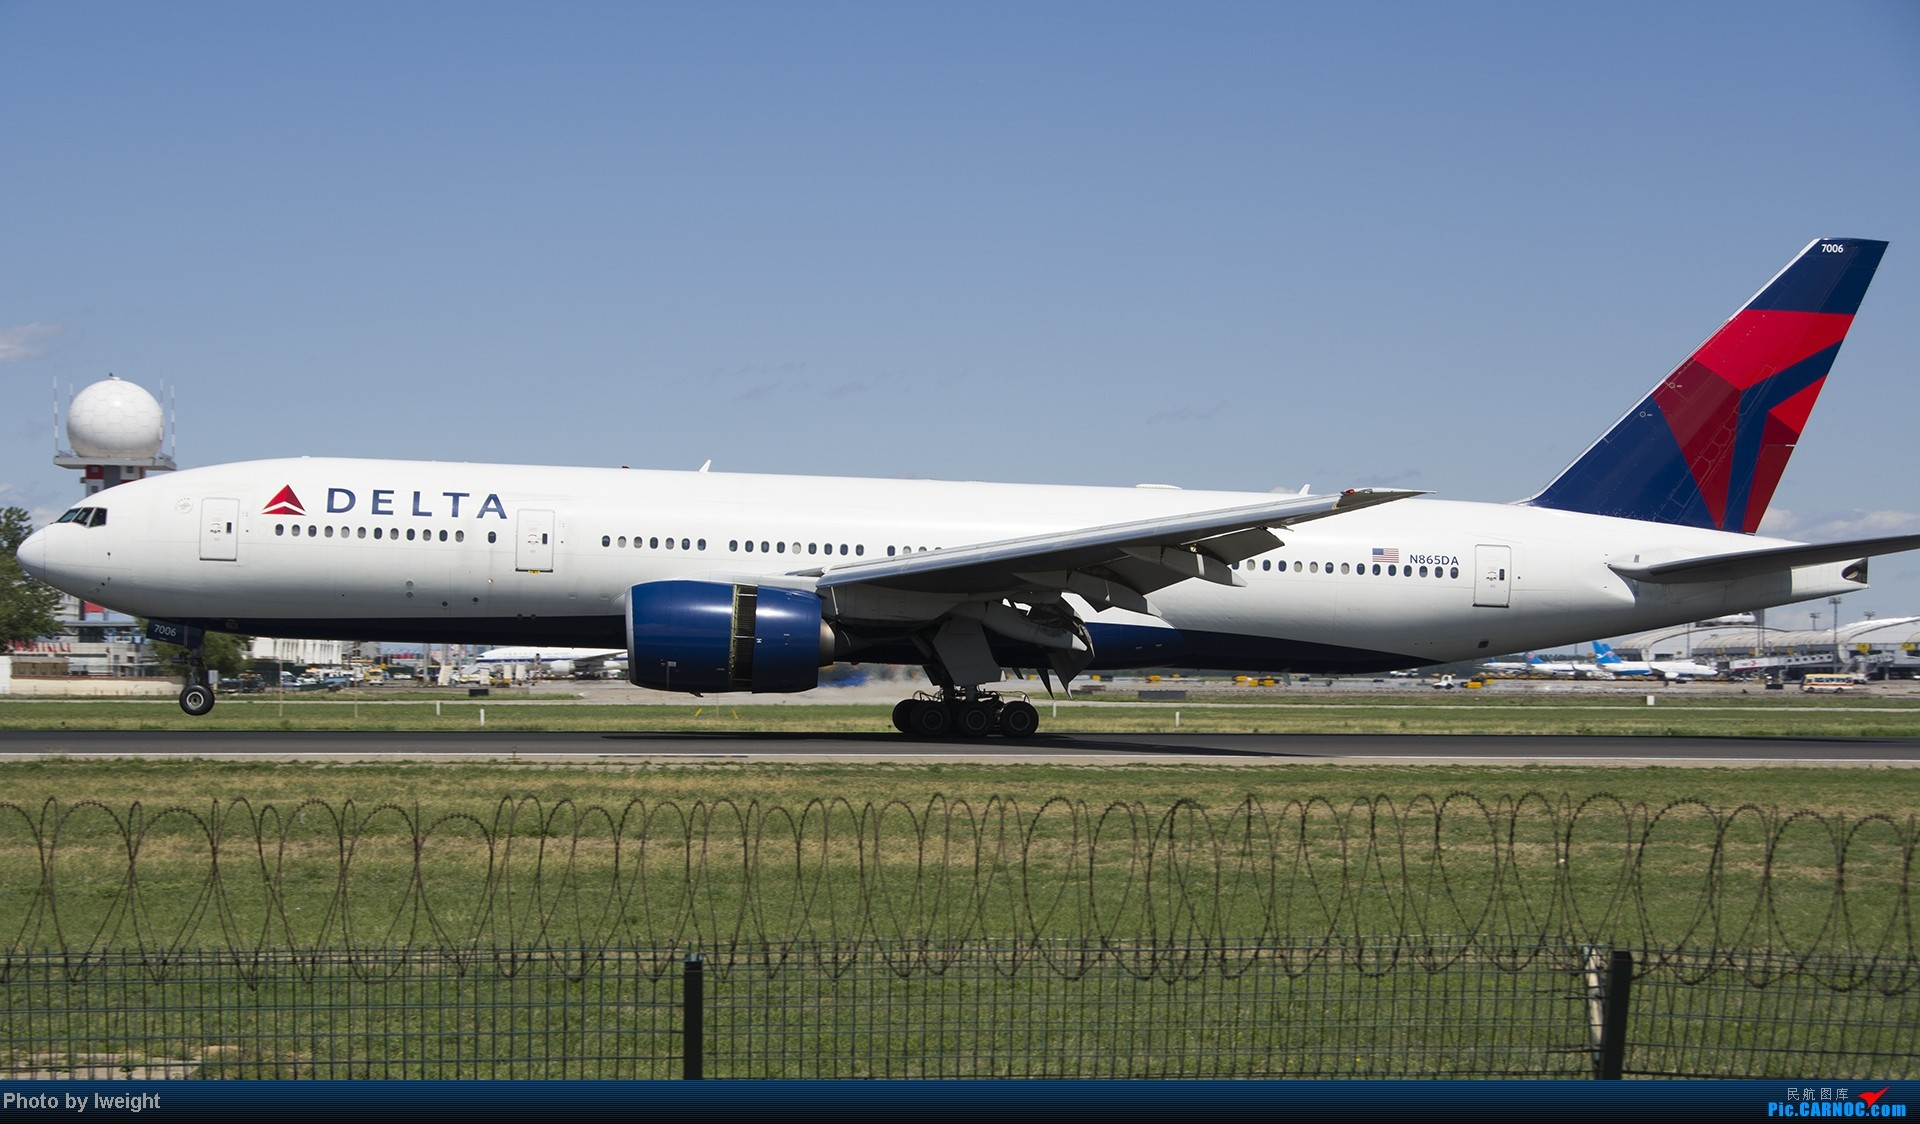 Re:[原创]新相机+好天气,PEK试机乱拍 BOEING 777-200 N865DA 中国北京首都机场